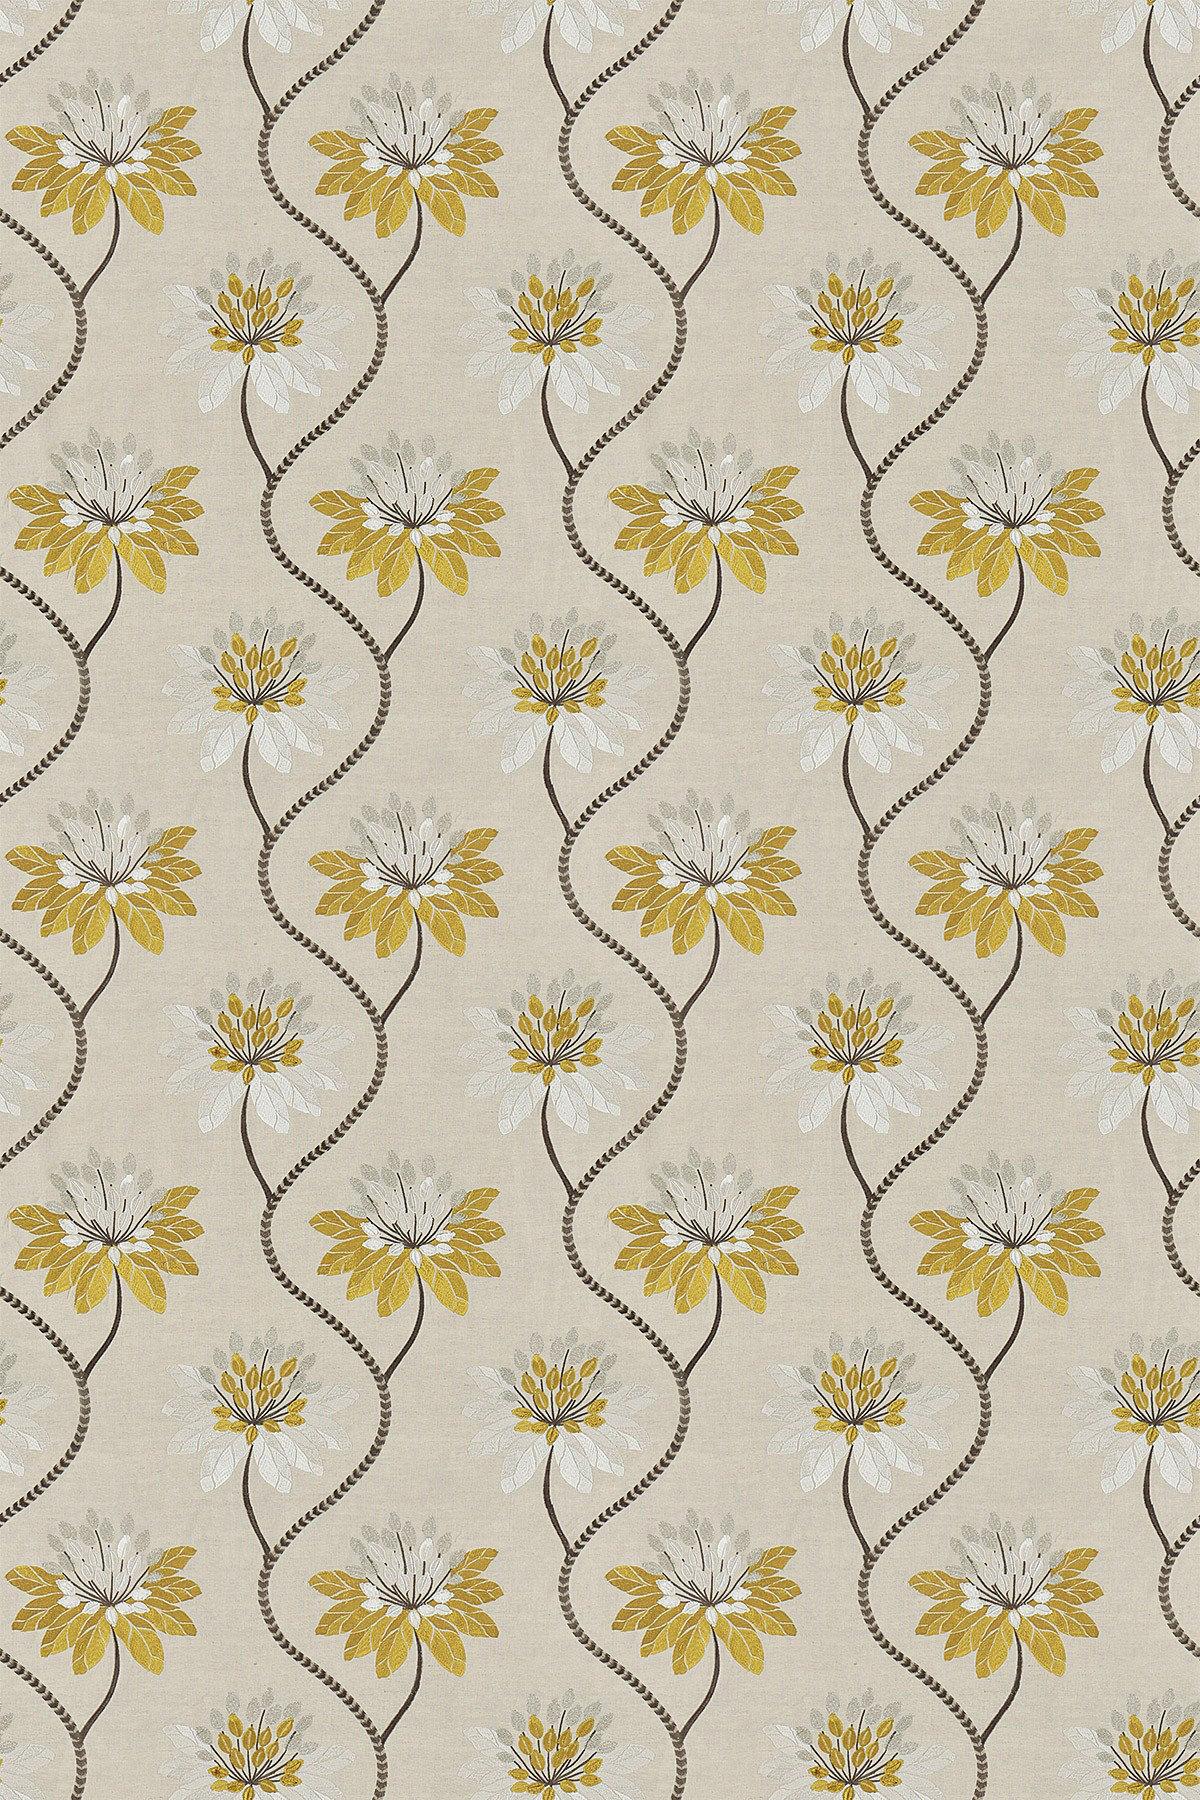 Harlequin Fabric Eloise, 131545